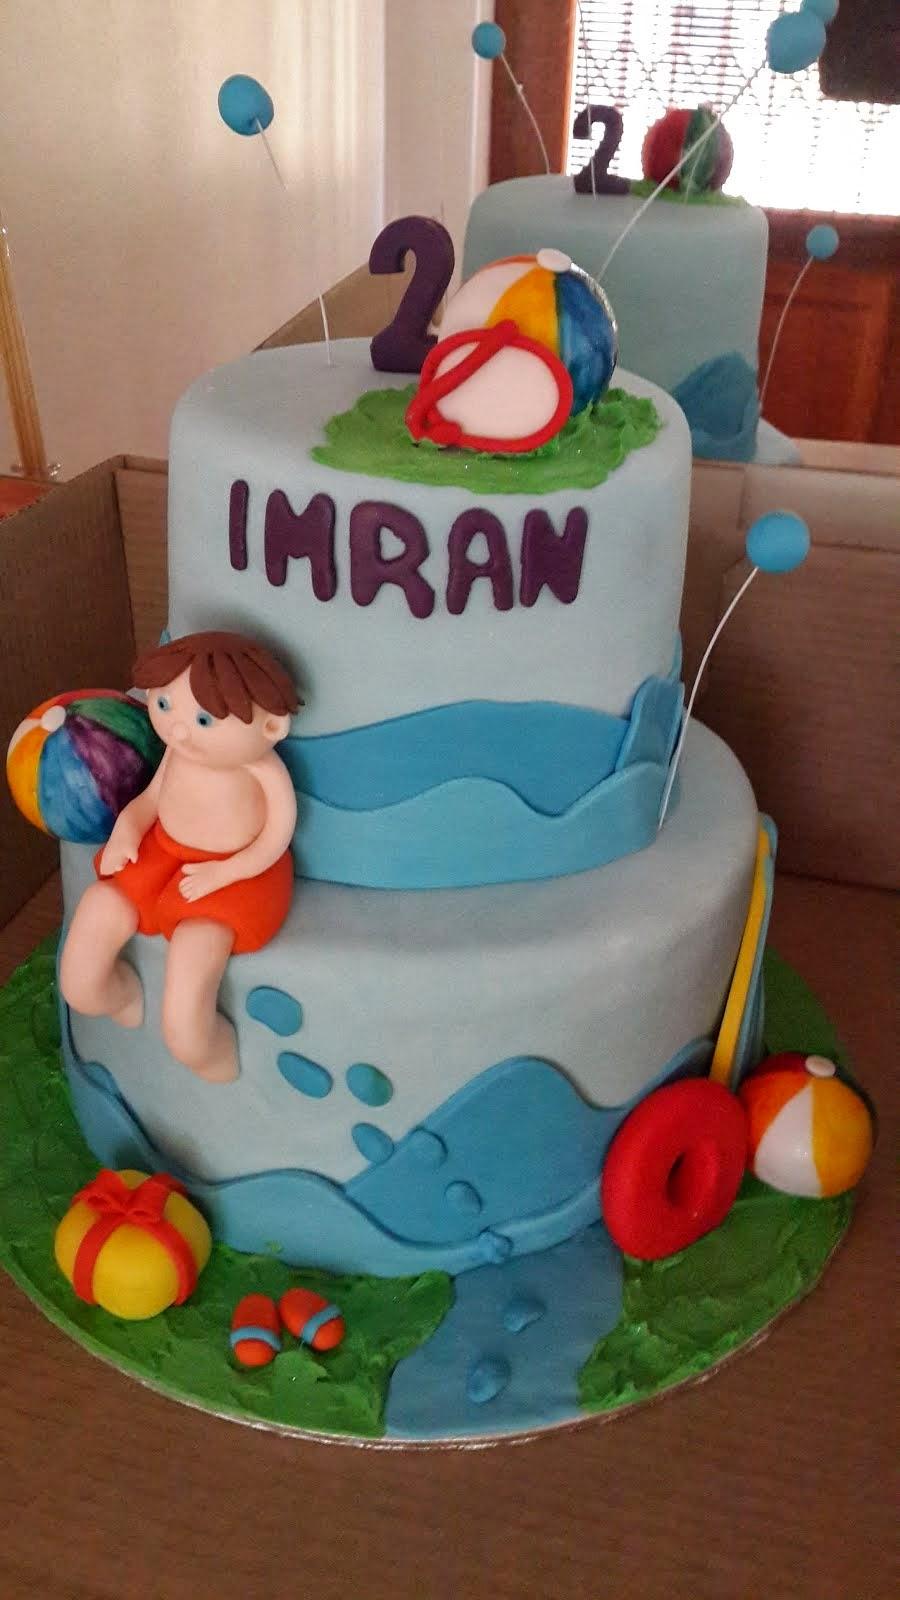 Imran's Beach Cake